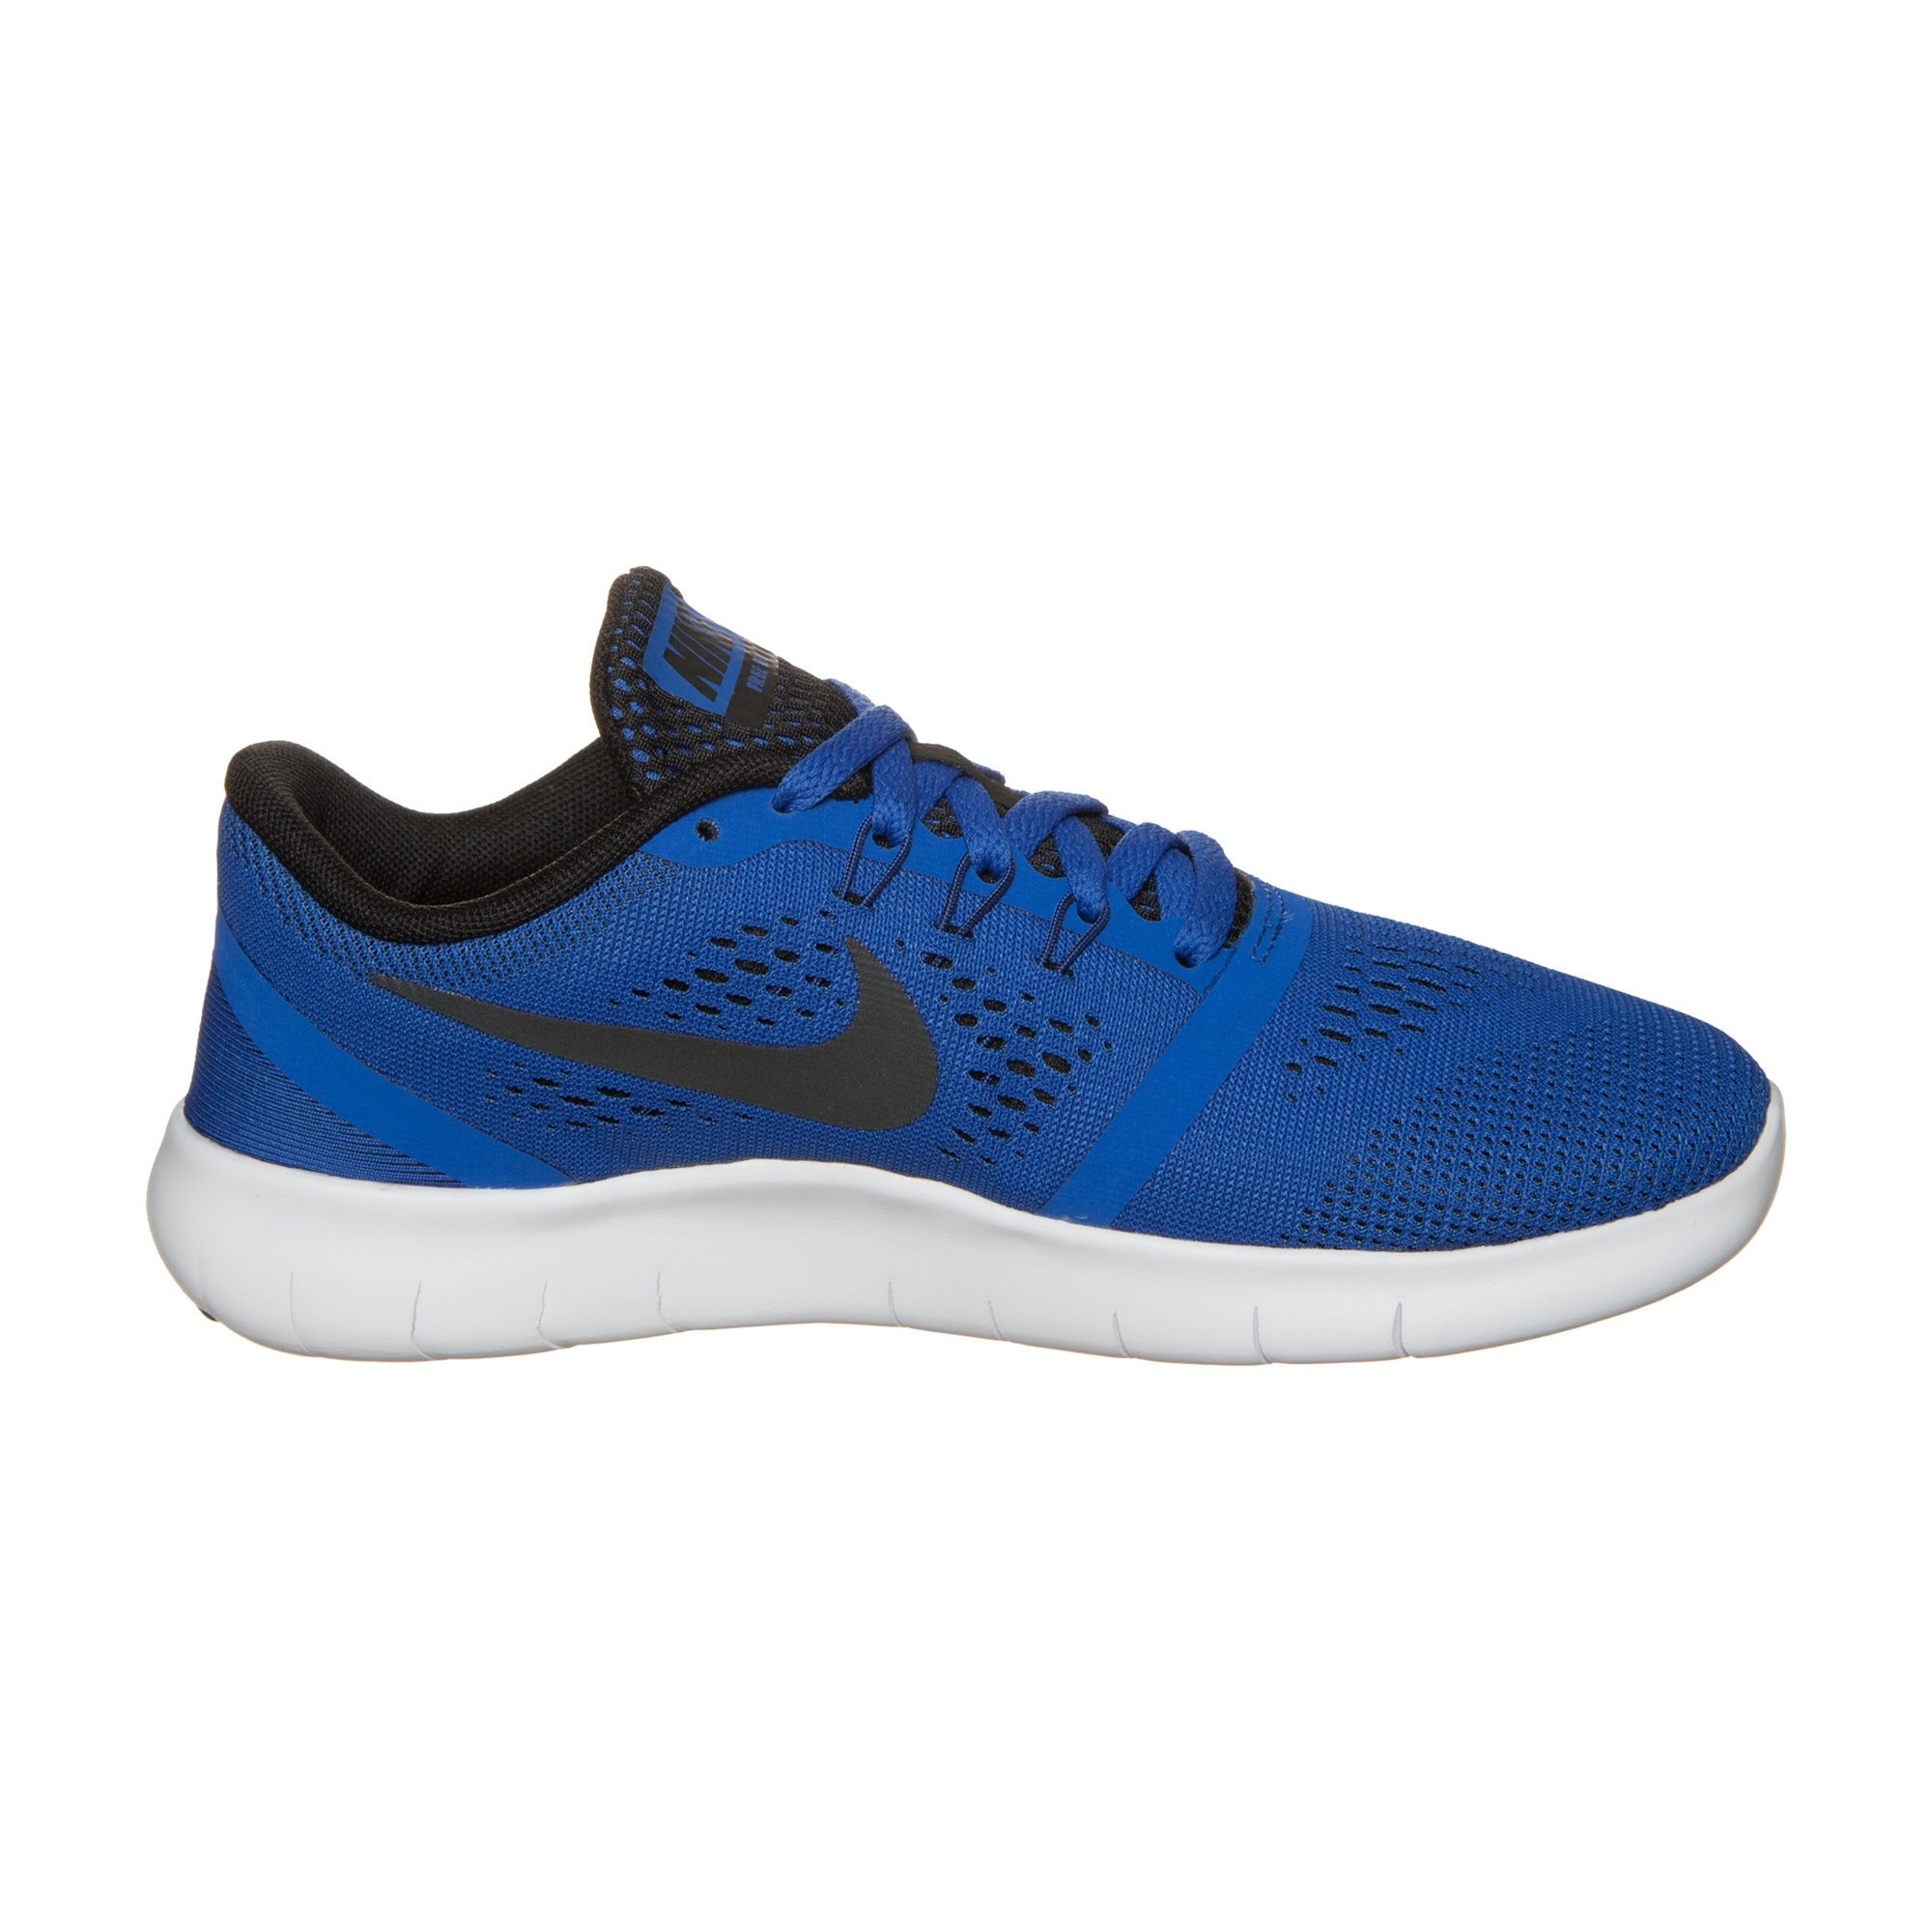 Nike Free RN GS in Blau